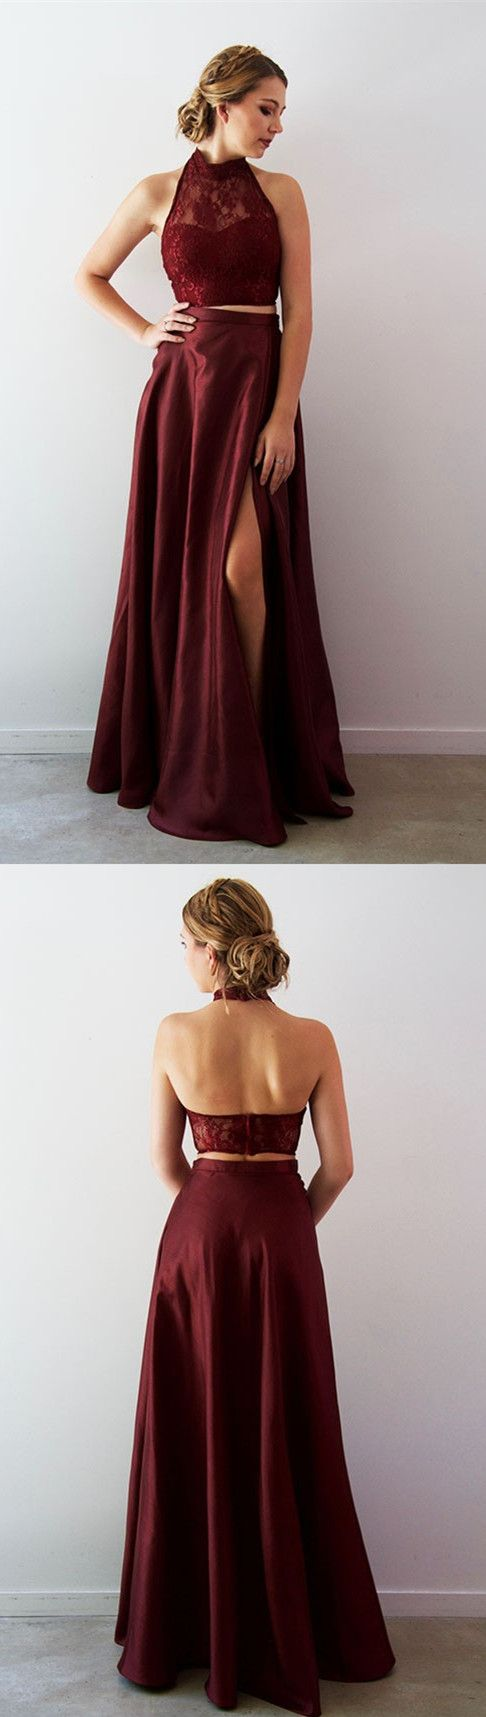 Elegant two piece high neck burgundy long prom dress with side slit